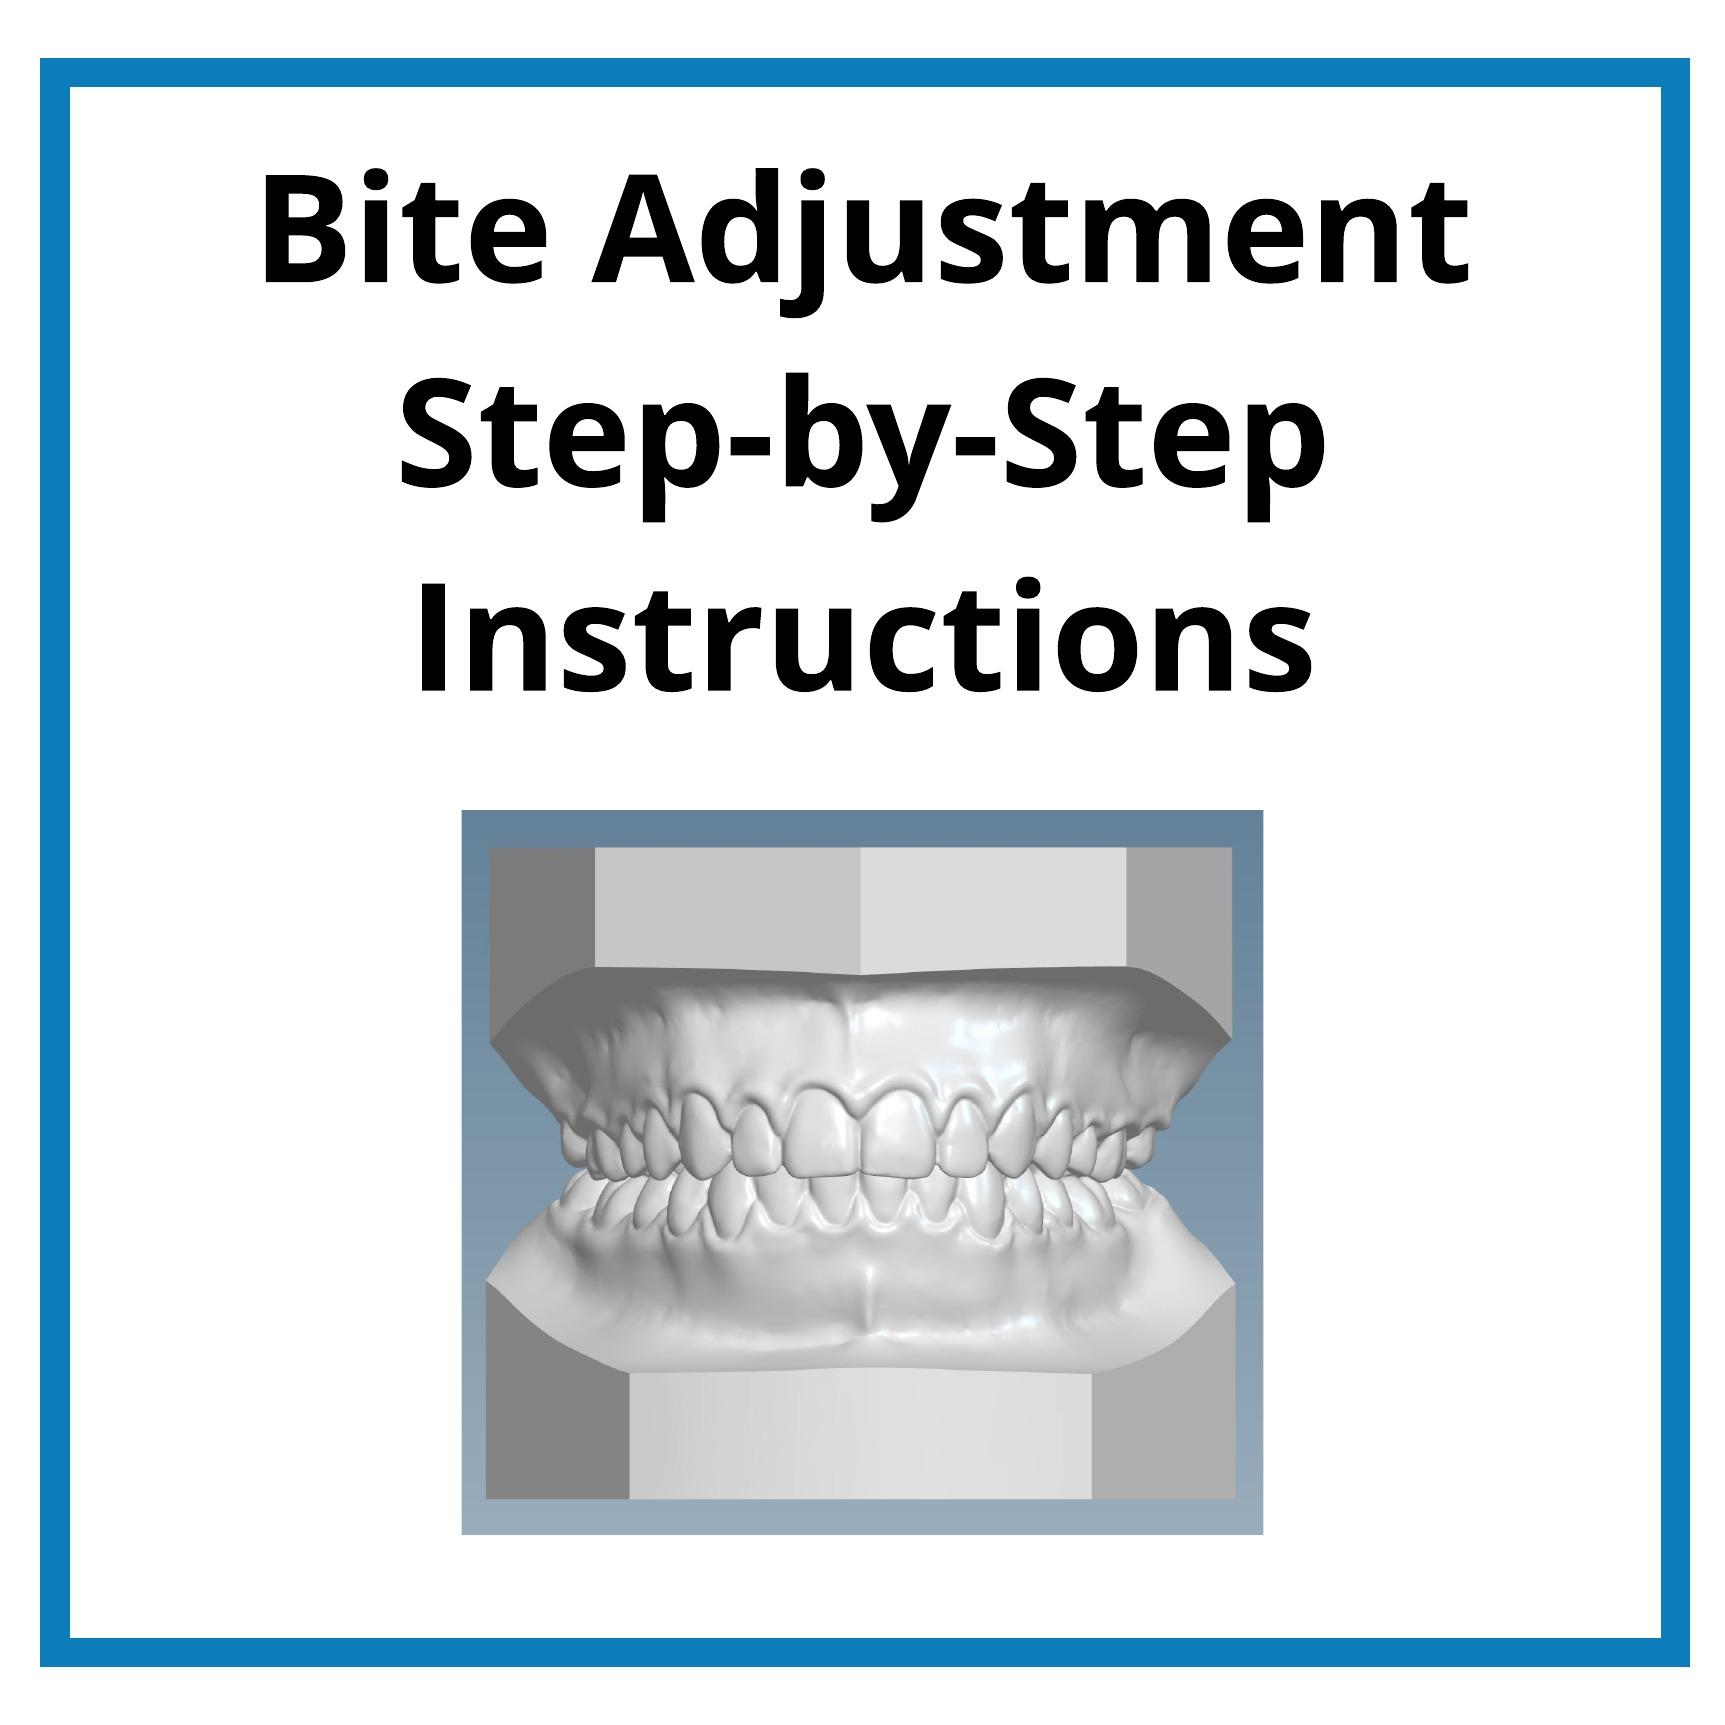 Bite Adjustment Step by Step Instructions.jpeg